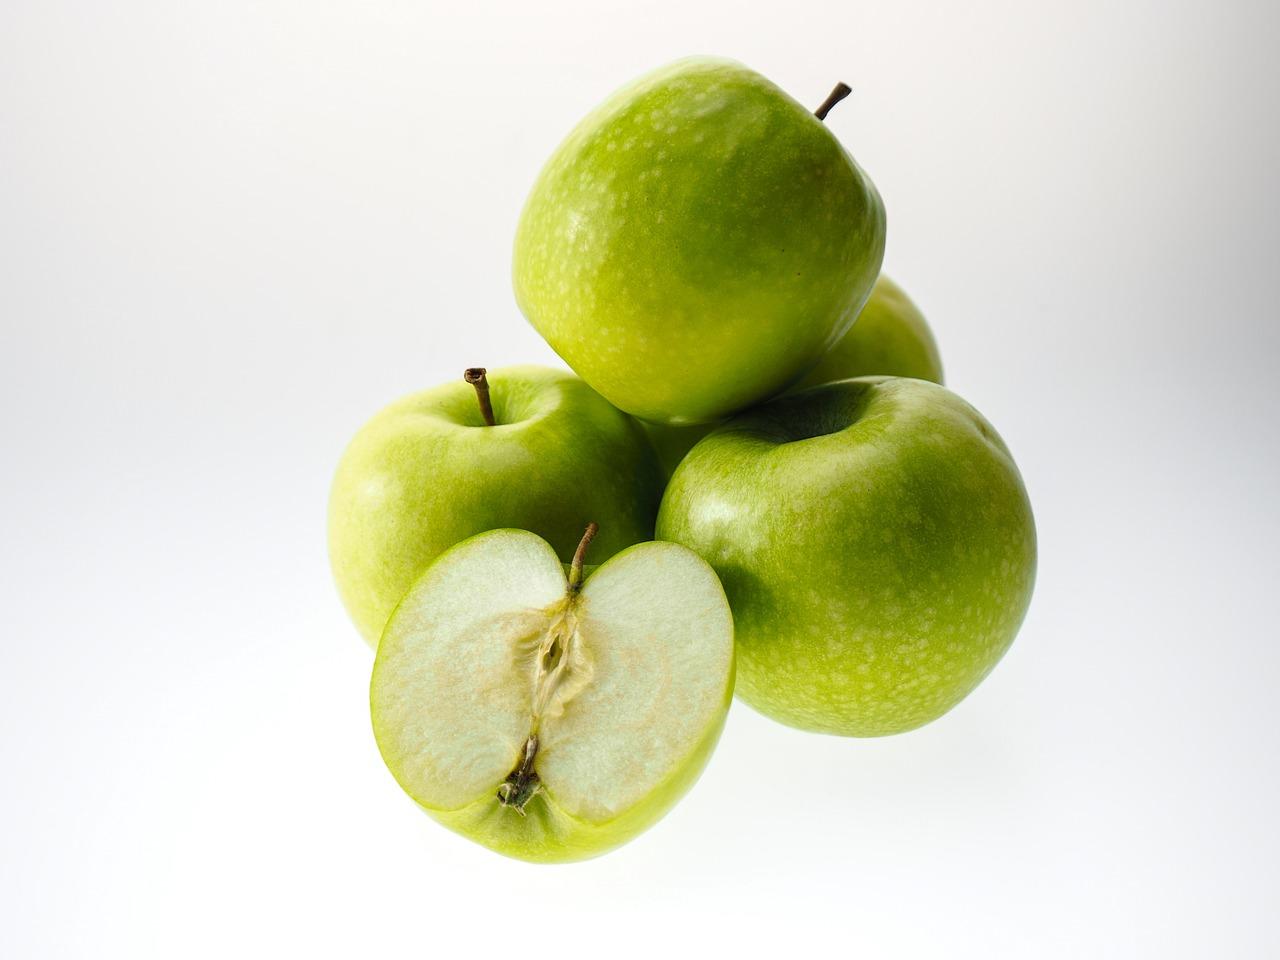 4 grüne Äpfel